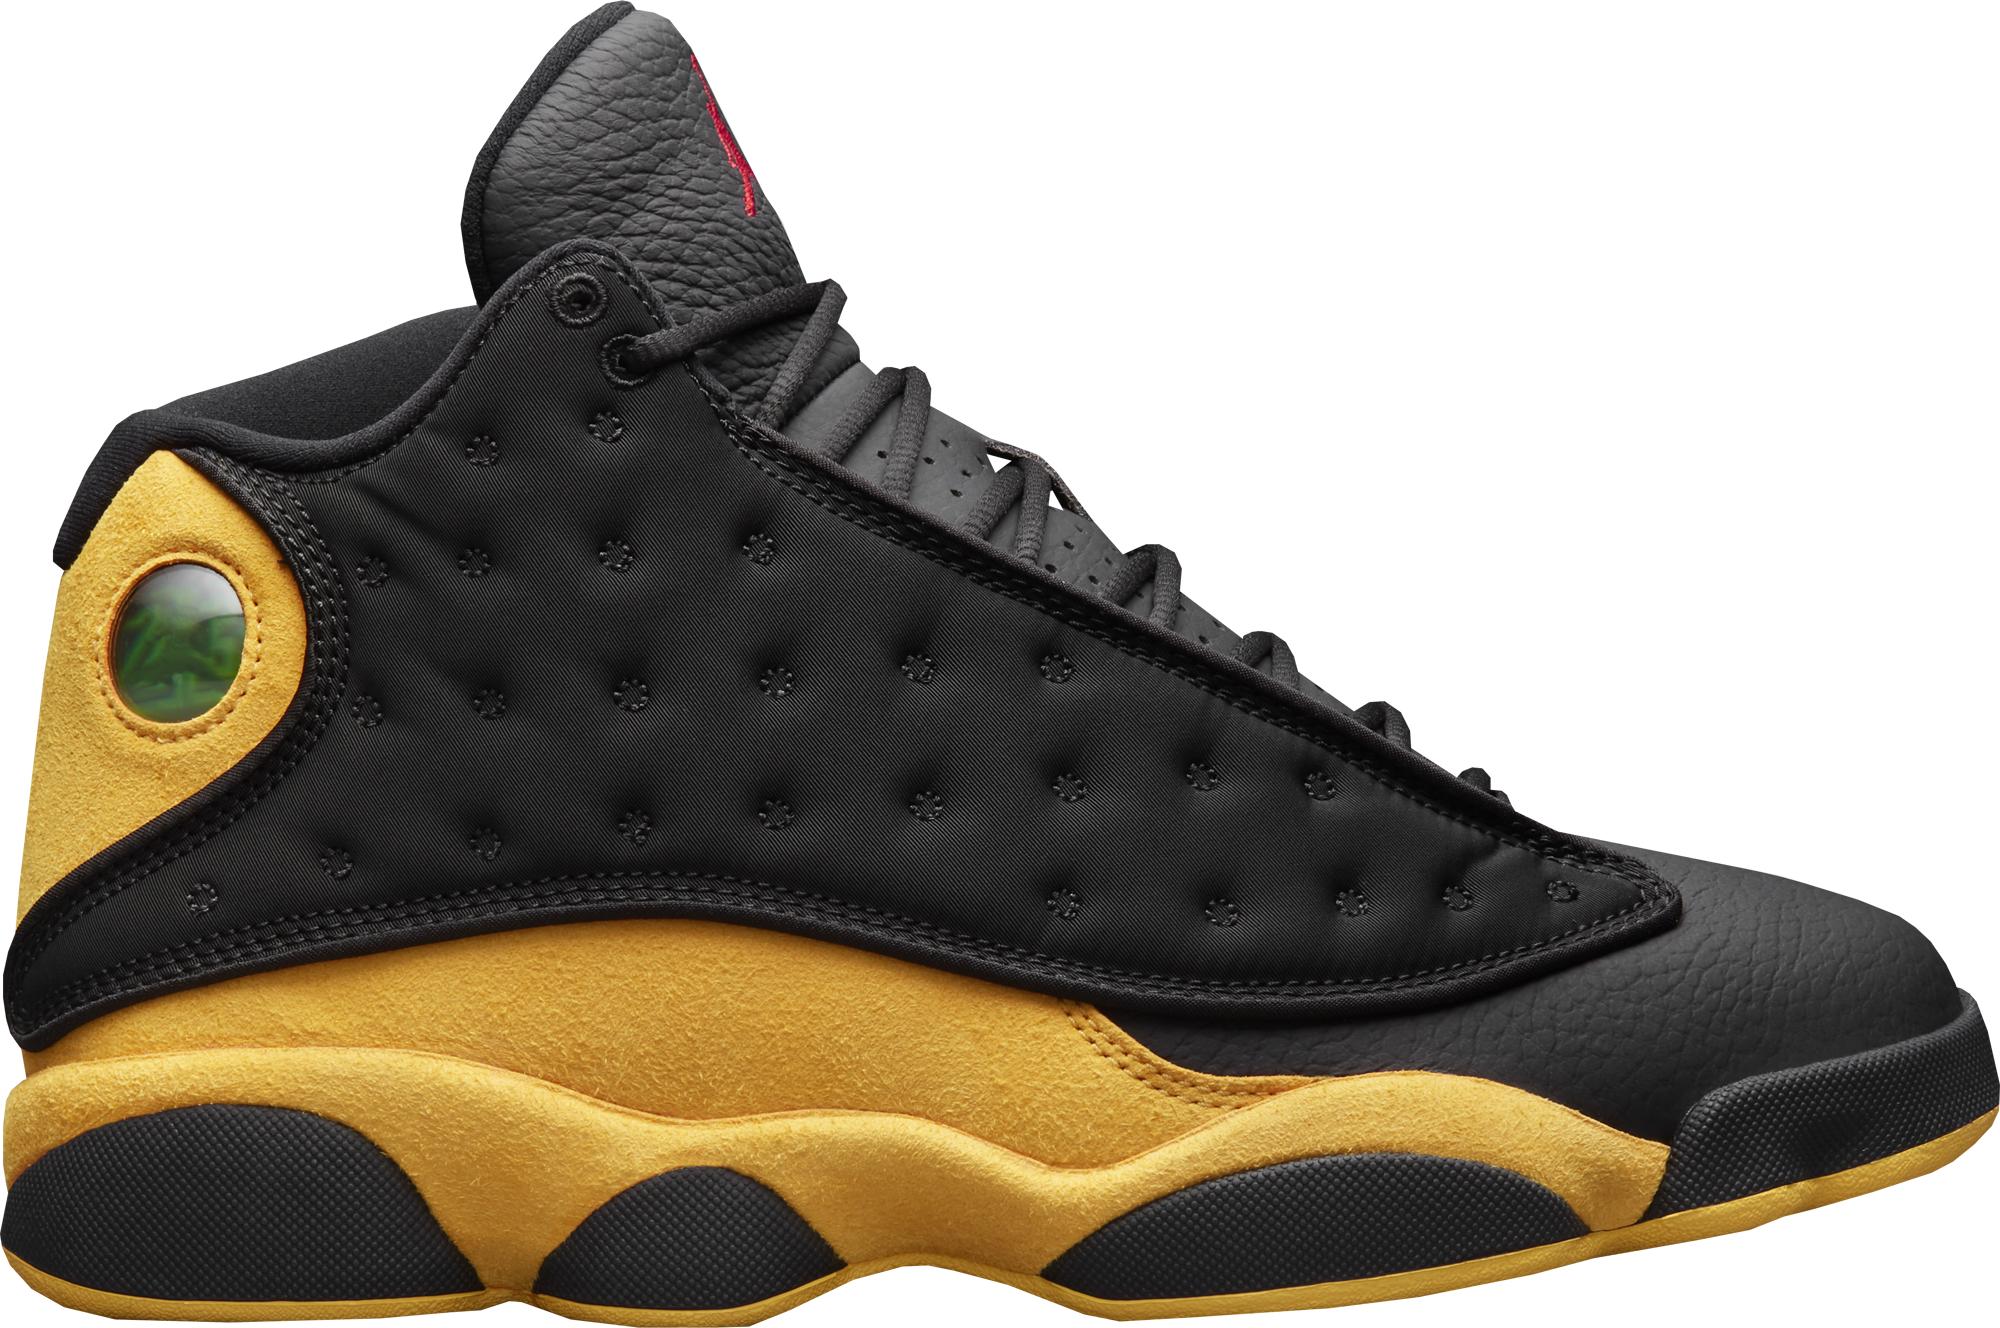 5c882d1db1589 ... buy air jordan 13 size 14 shoes deadstock sneakers